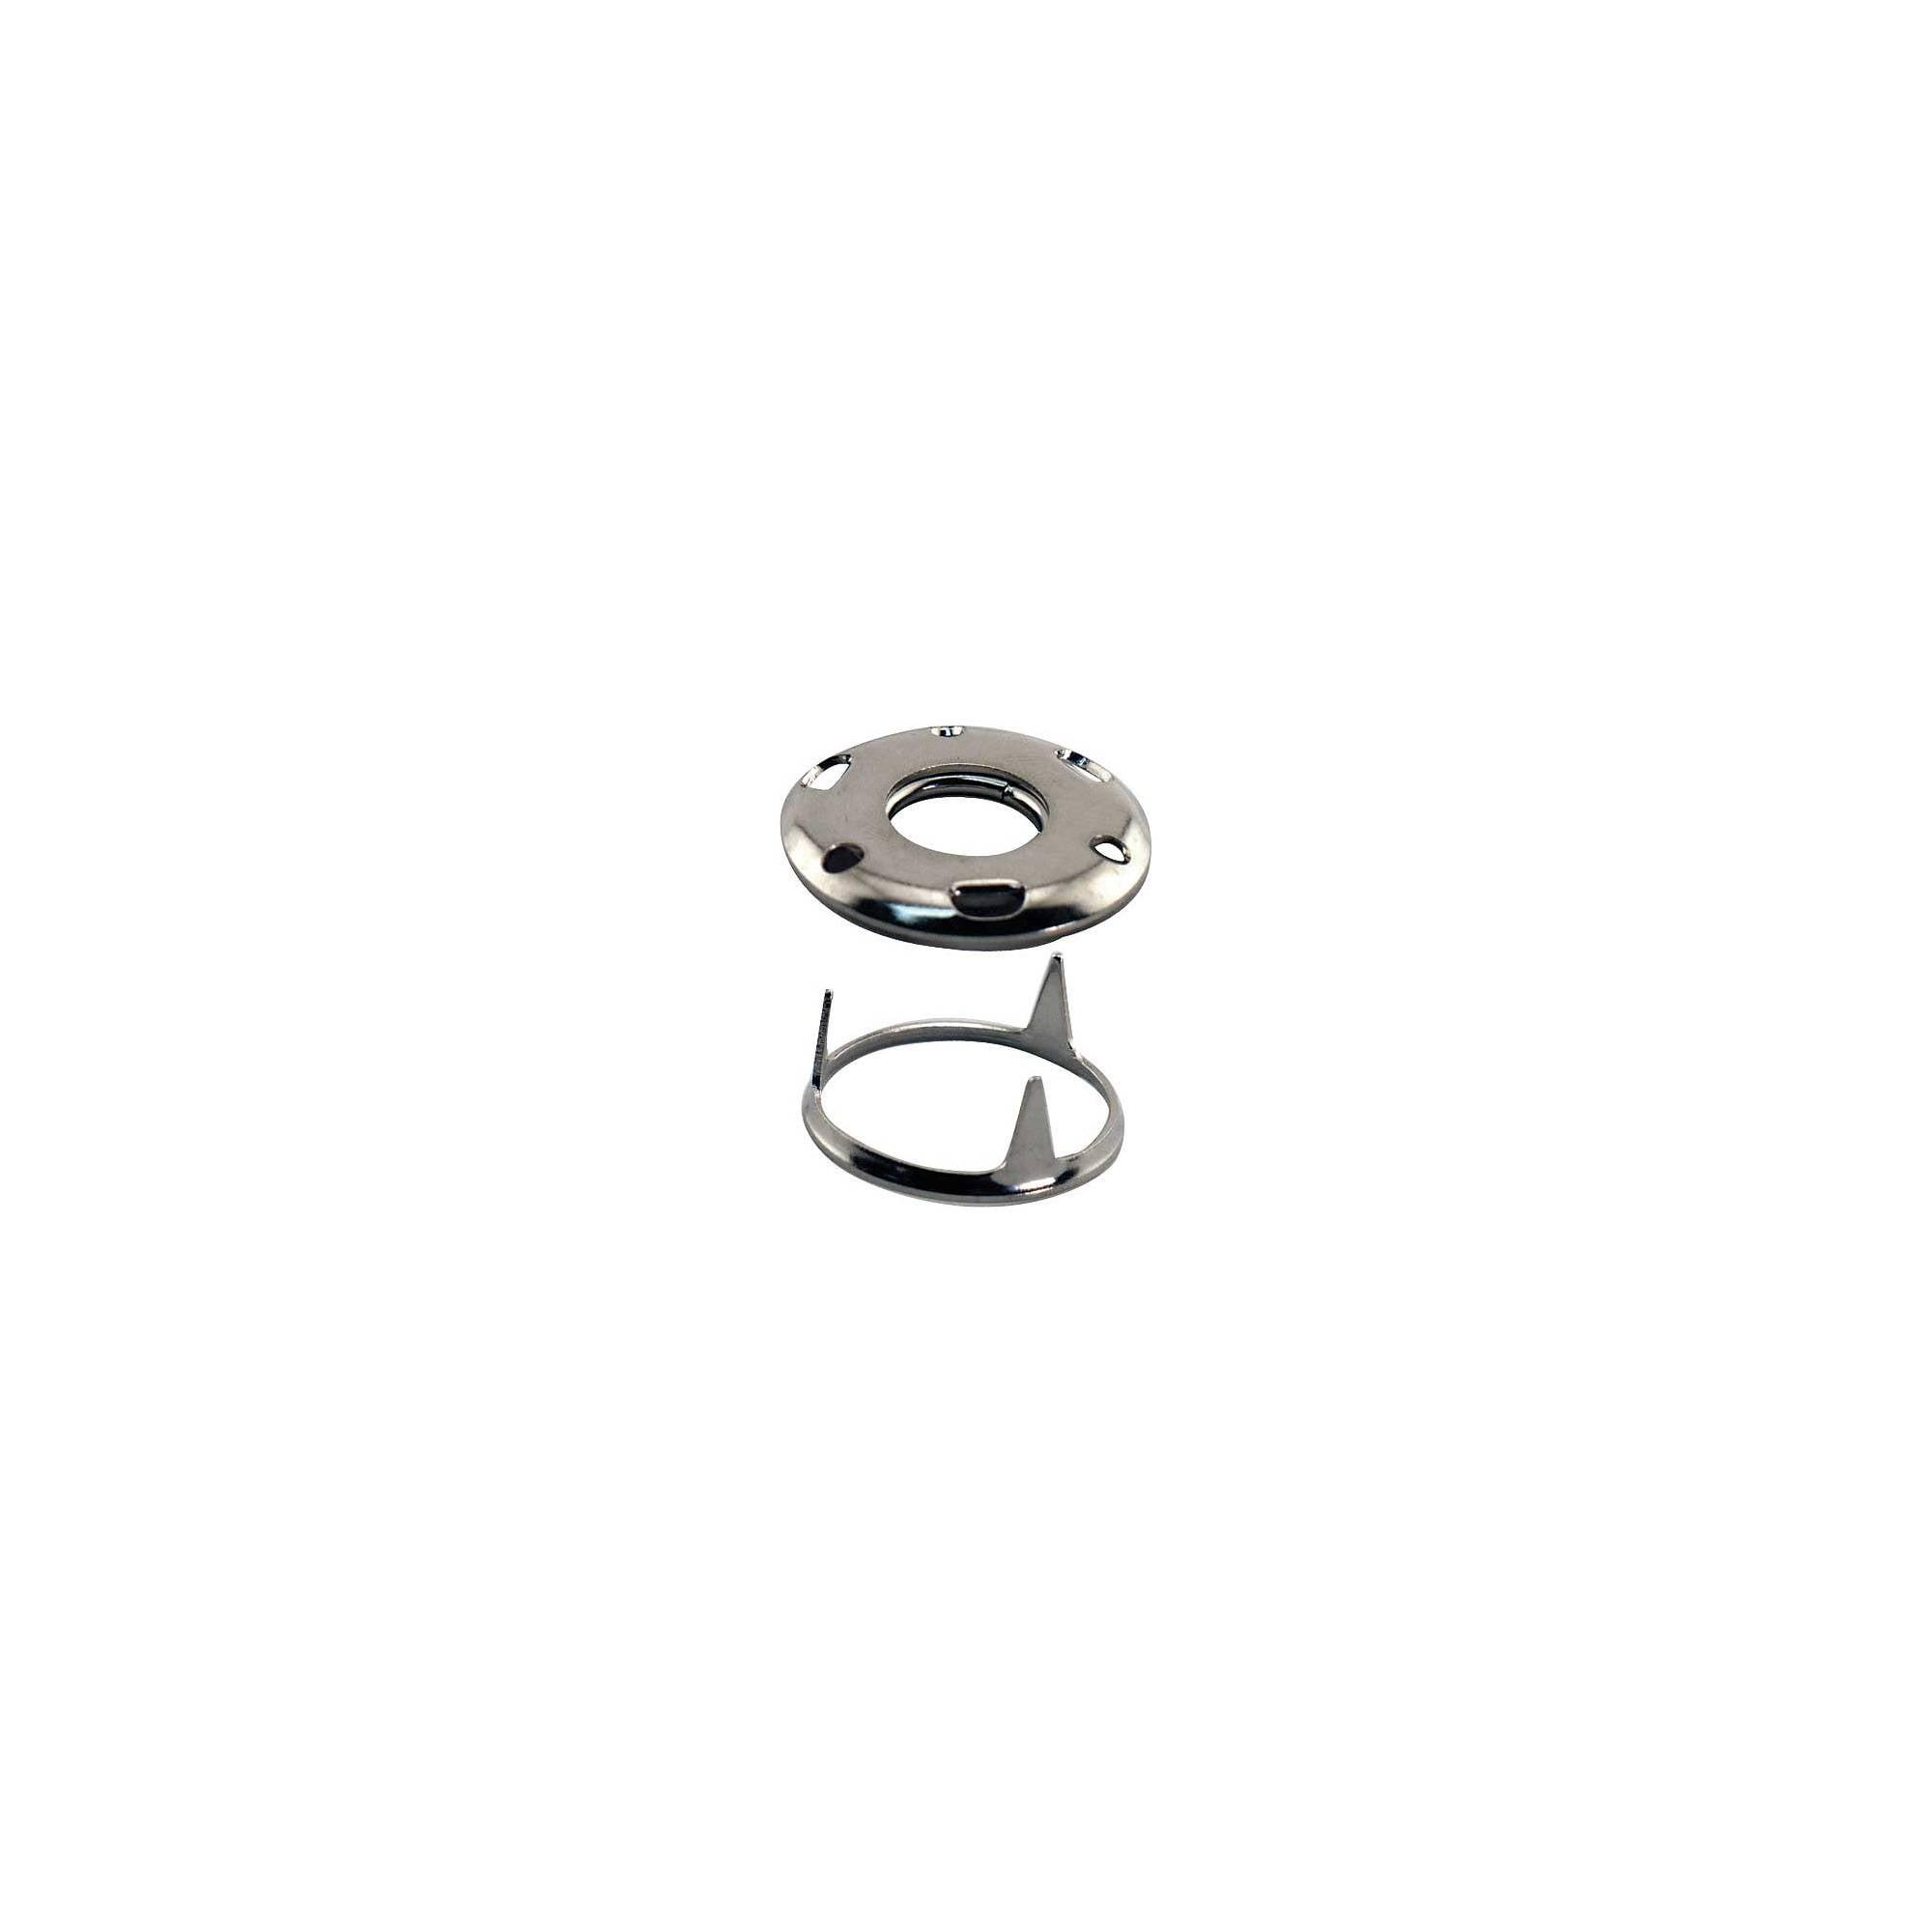 MACs Auto Parts Premier  Products 28-59679 Model A Ford Carpet Fastener Set - Nickel - 2 Pieces